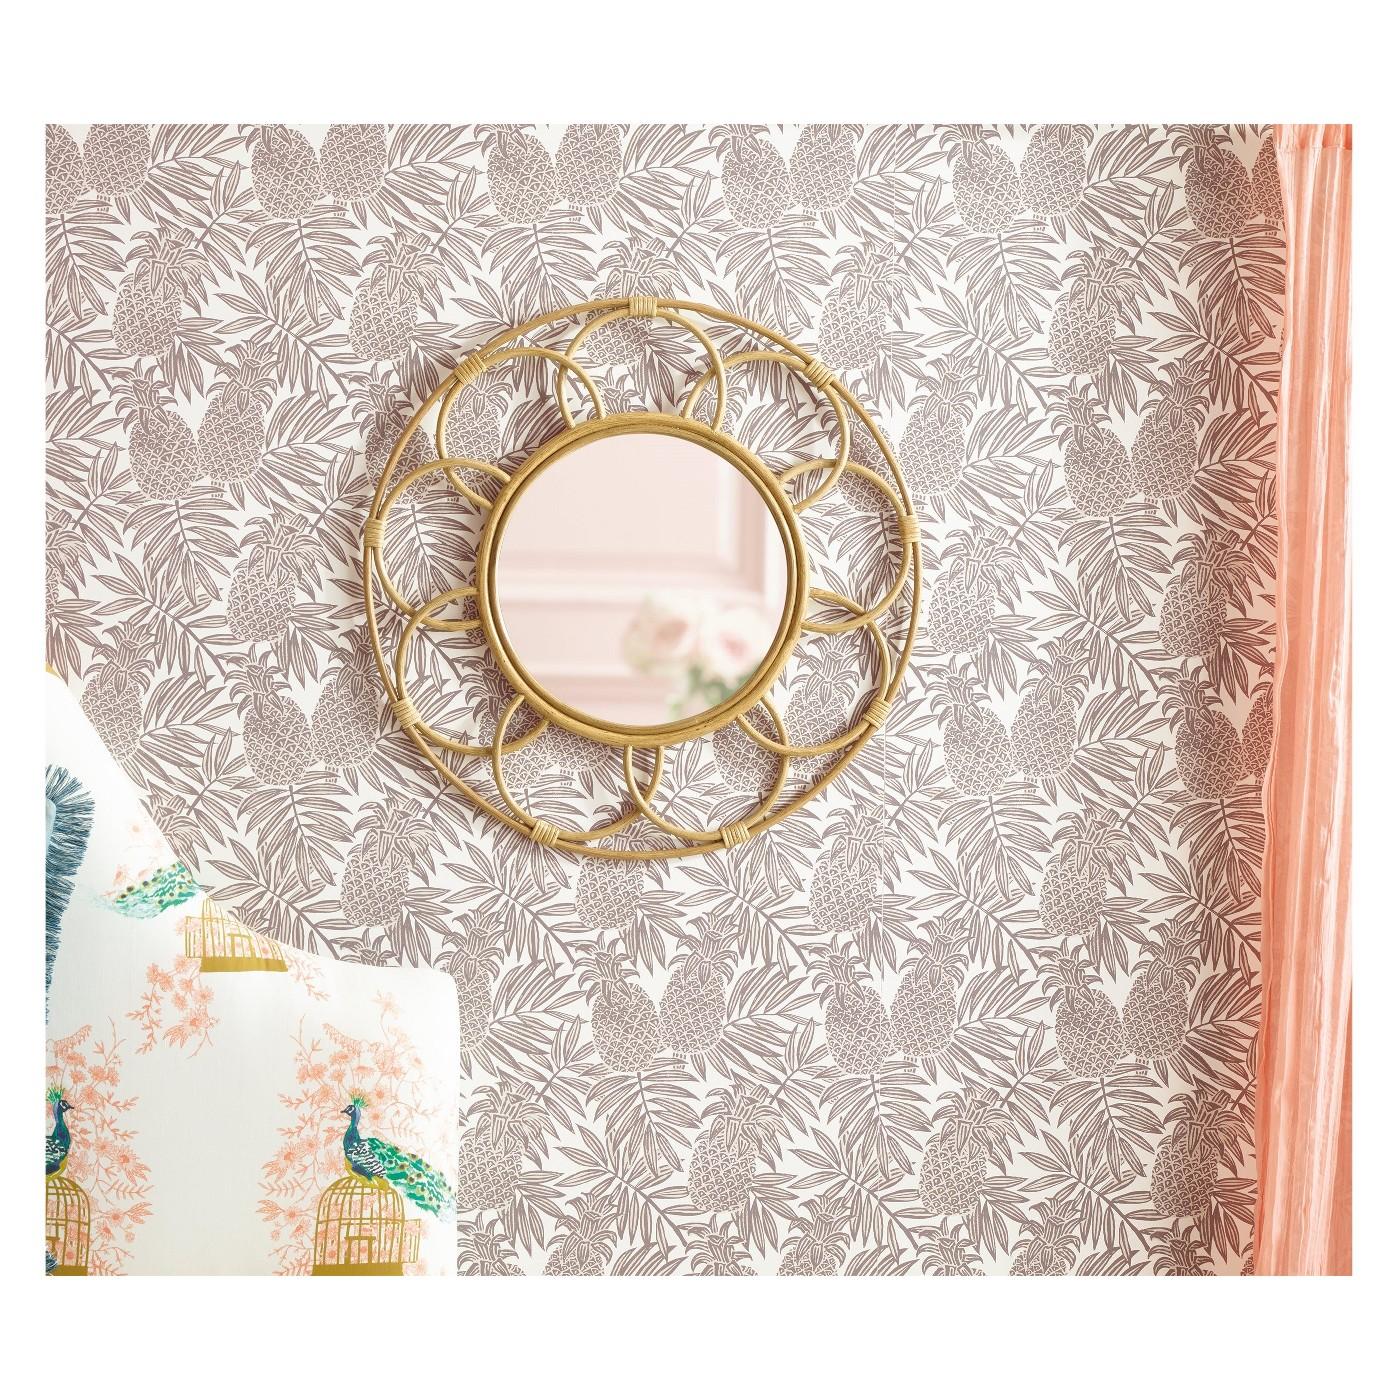 Round Rattan Mirror with Scalloped Border - $47.49